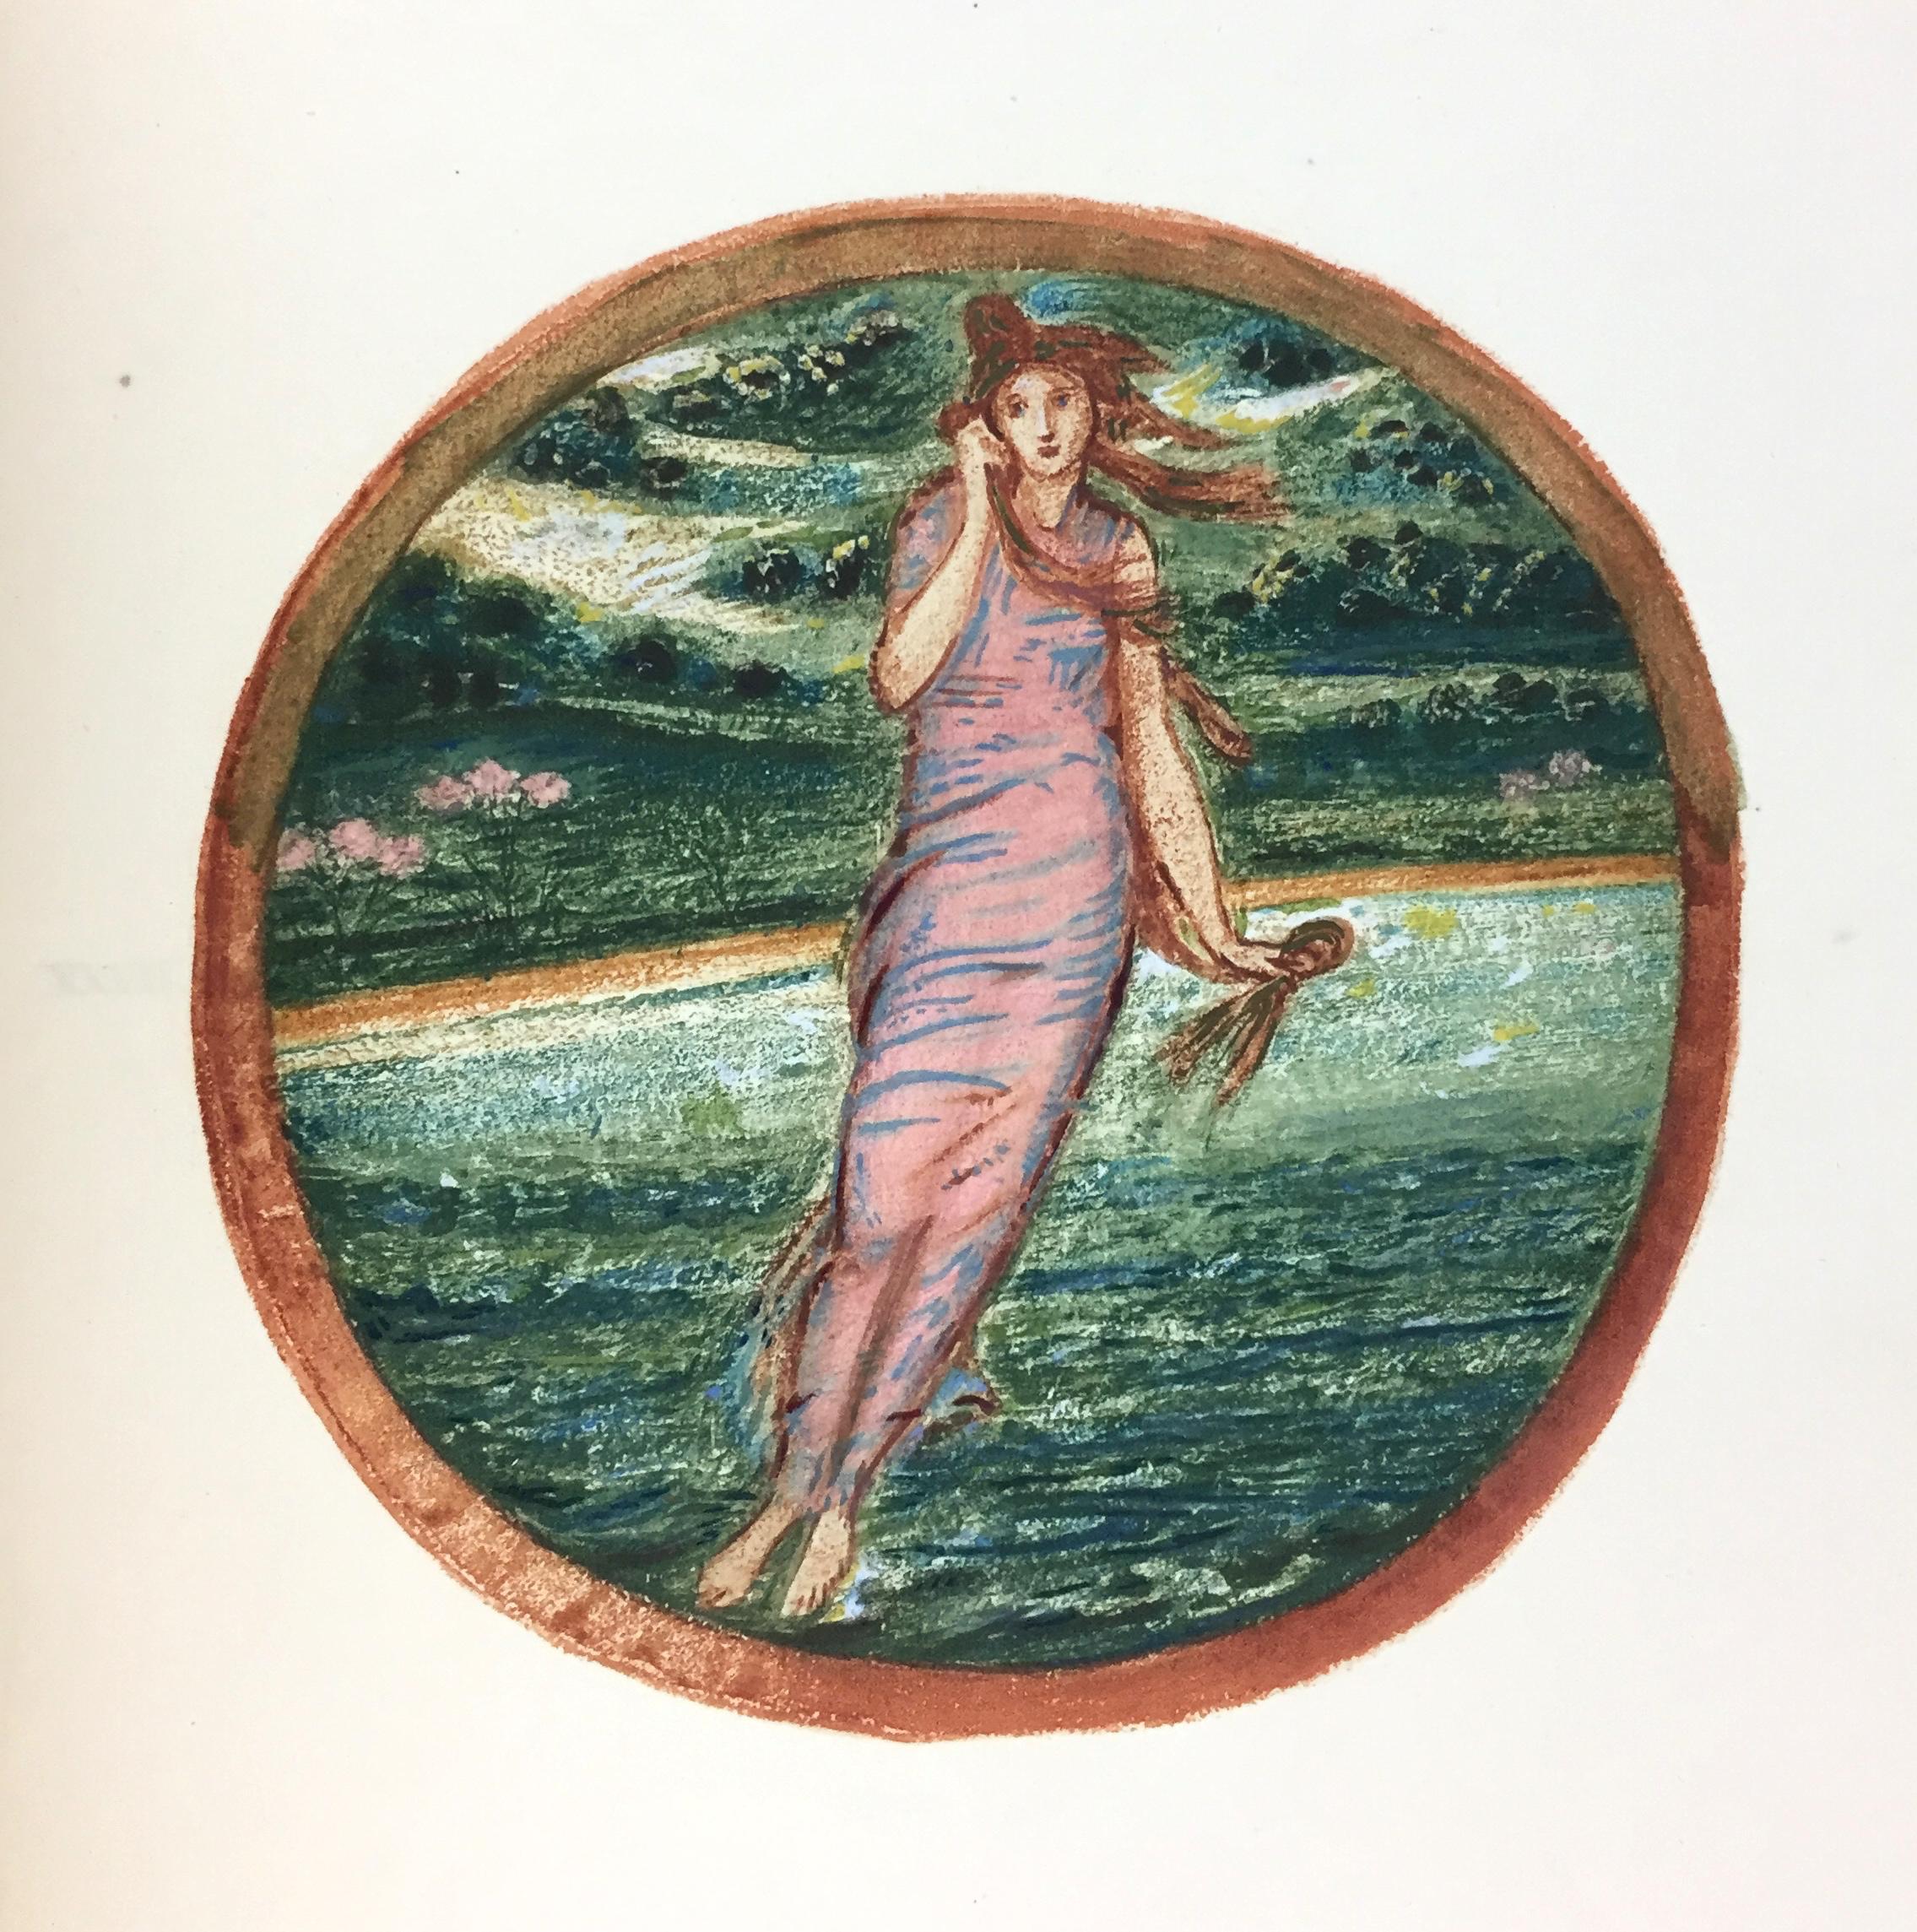 Illustrated Book by Edward Burne-Jones